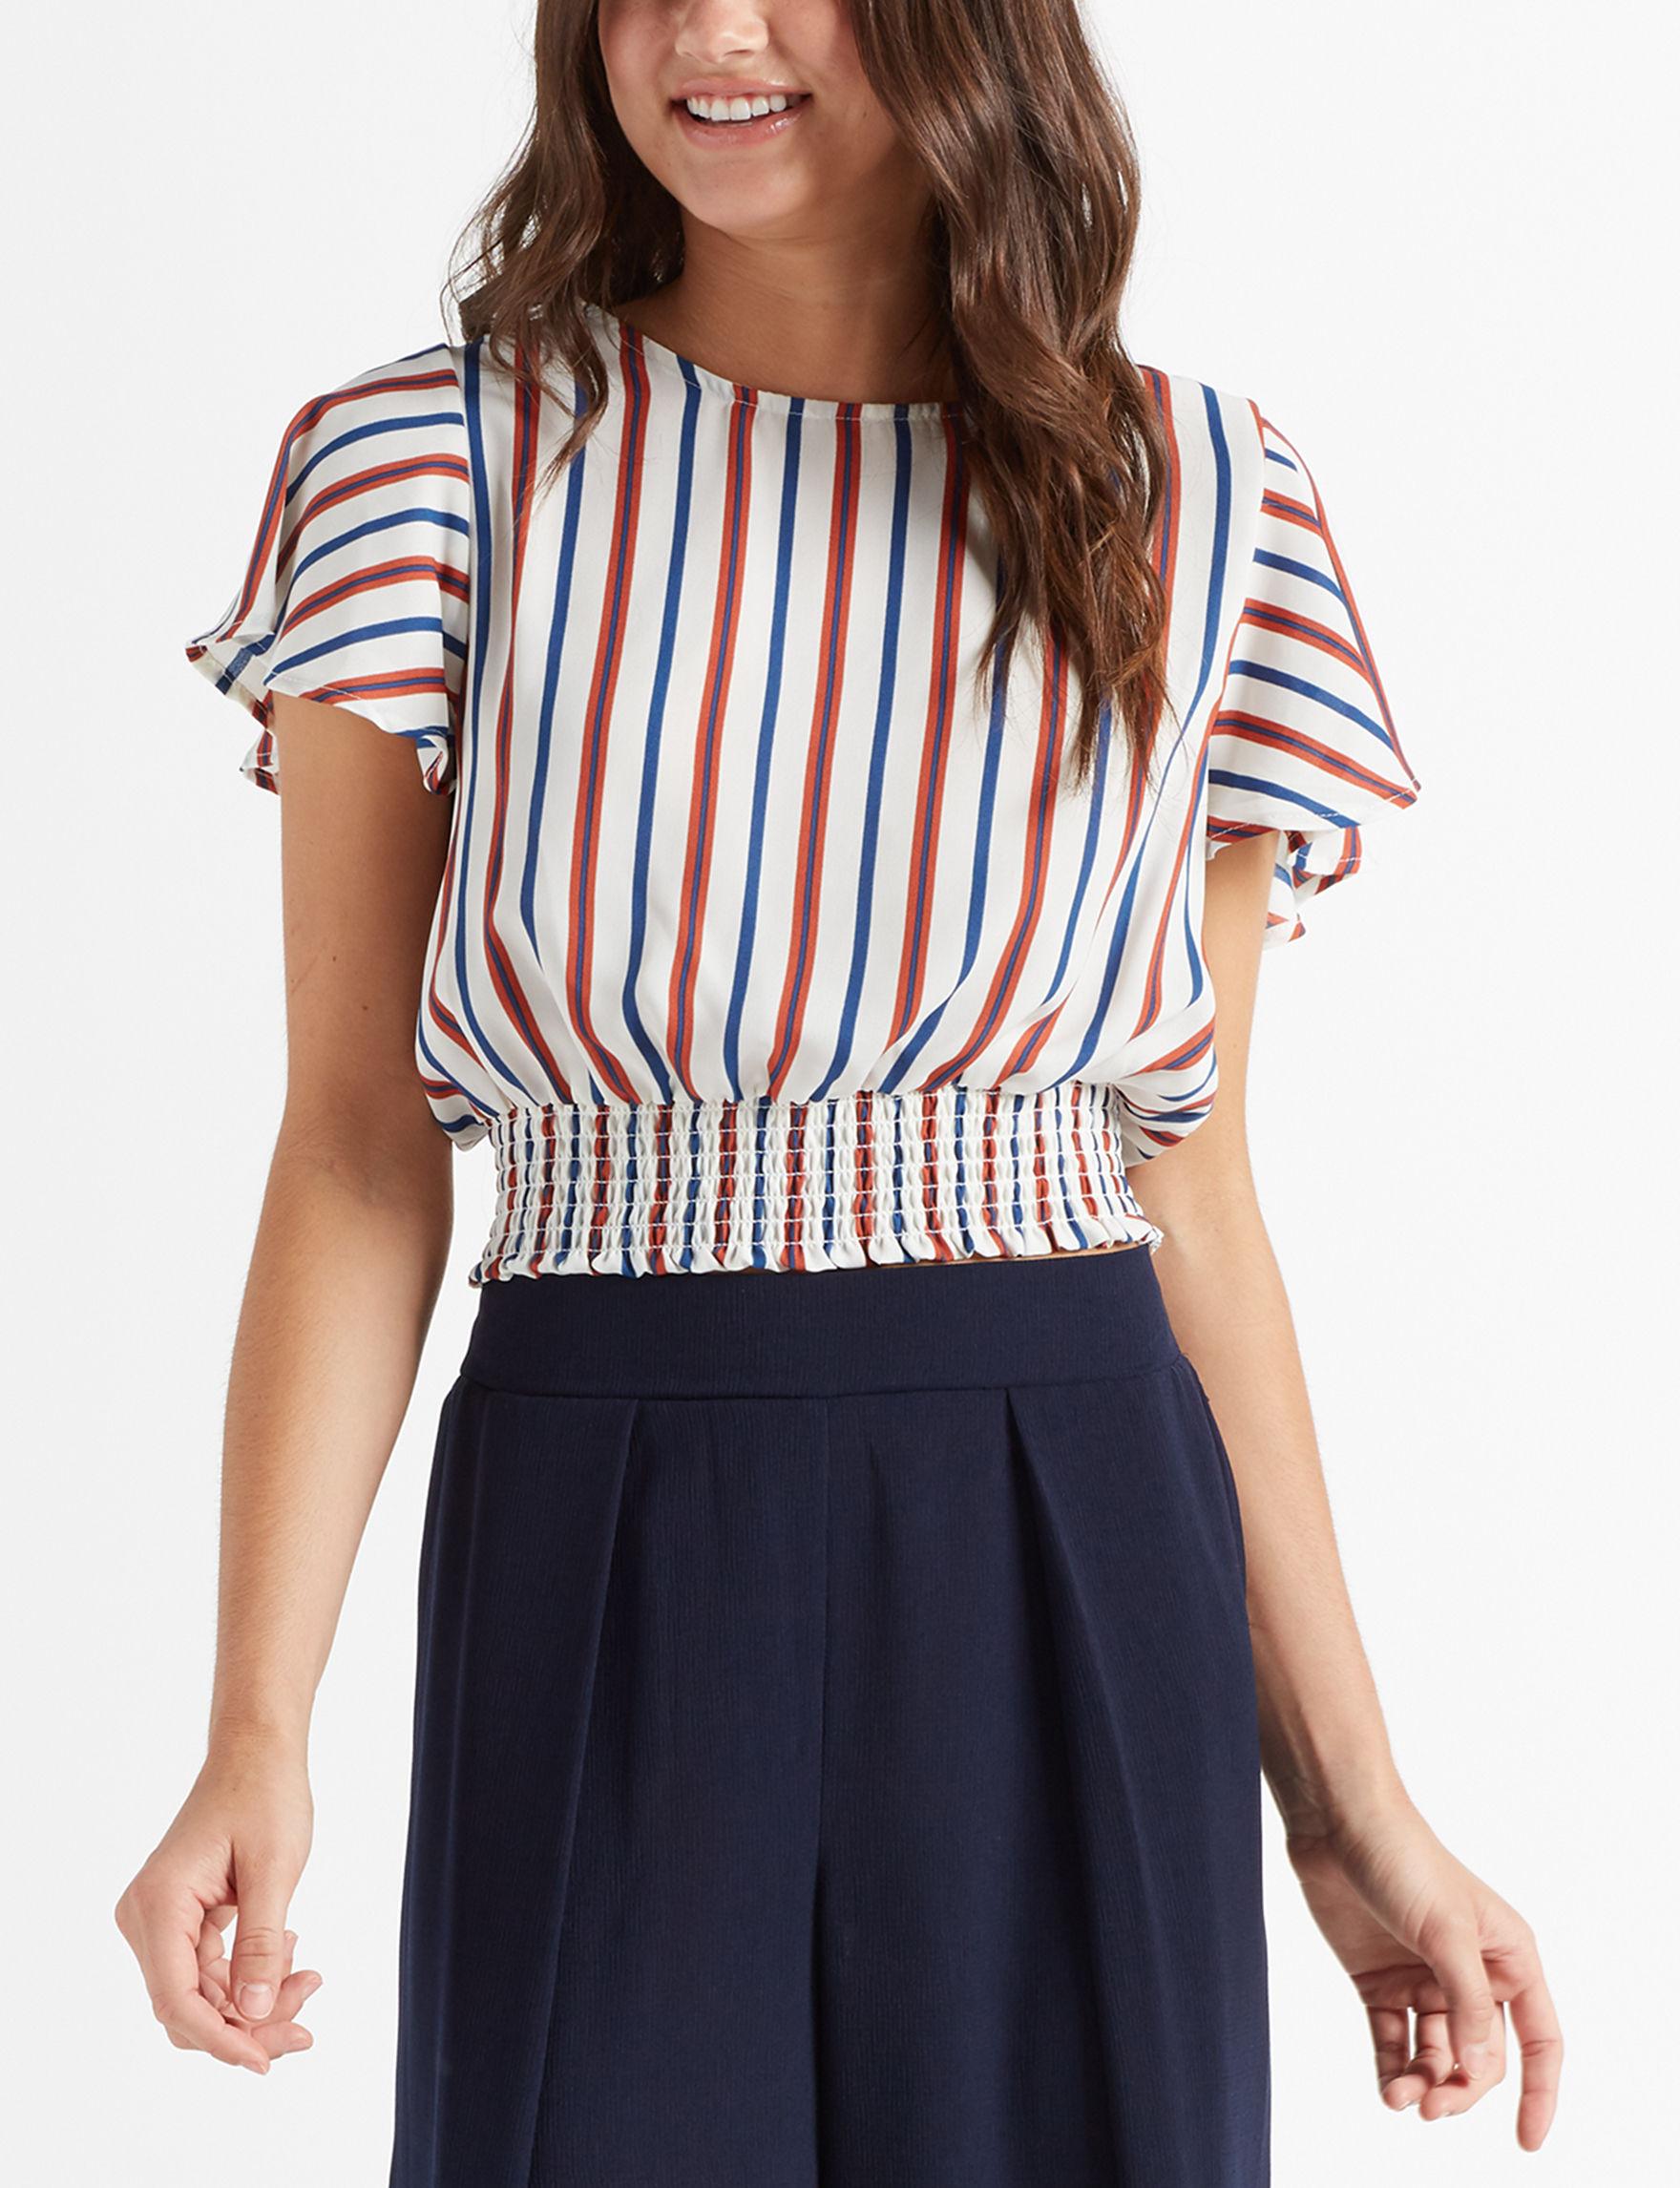 Charmed Hearts Navy Shirts & Blouses